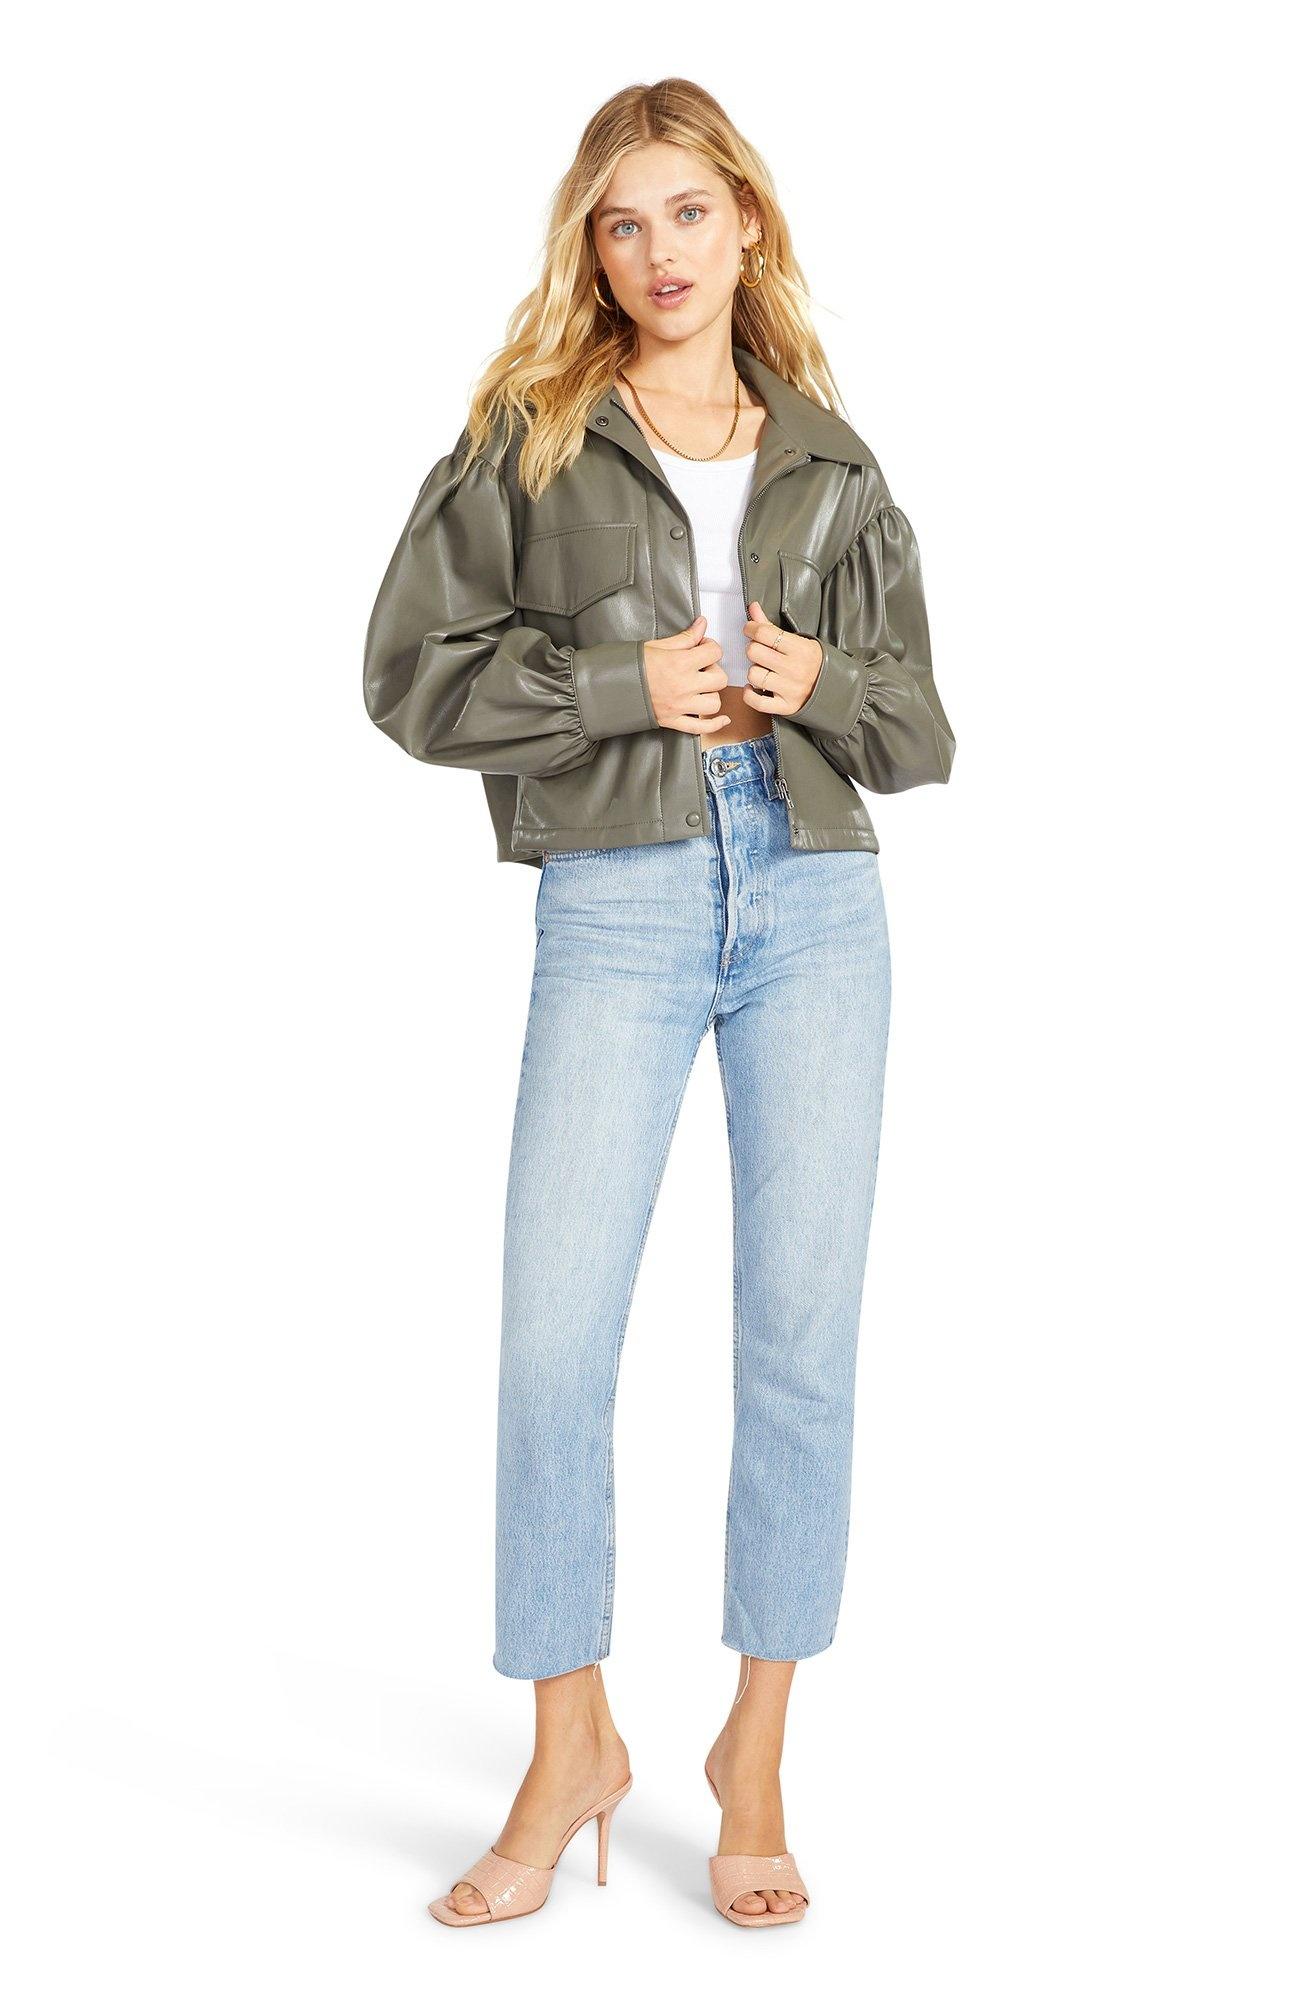 BB Dakota Love On Crop Shirt Jacket